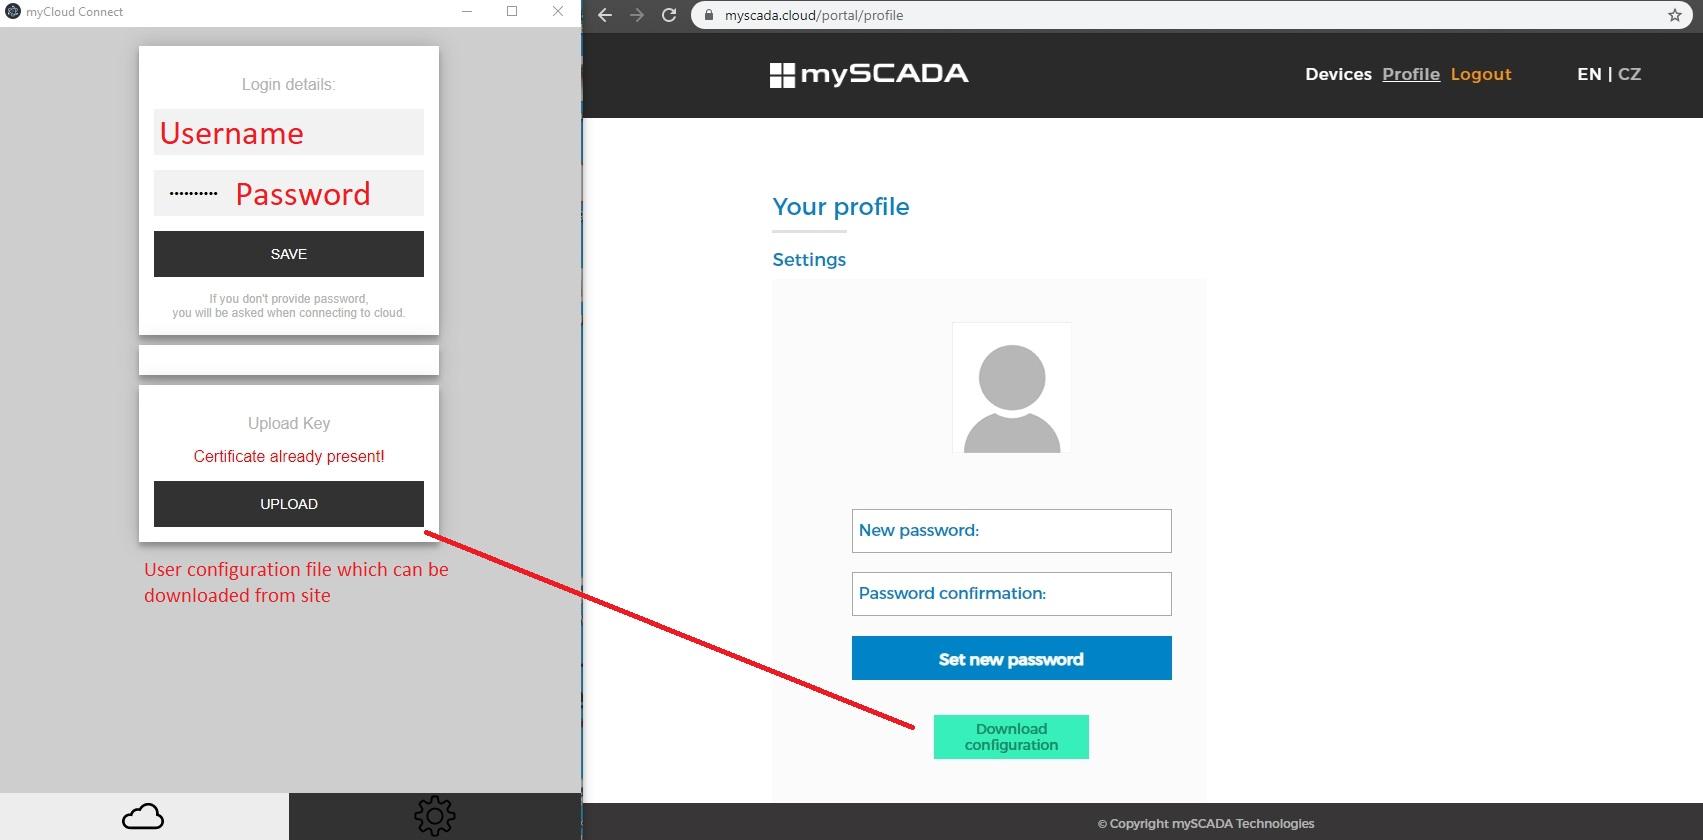 https://myscada.org/downloads/manuals_image/myCLOUD_screens/Screenshot_69.jpg